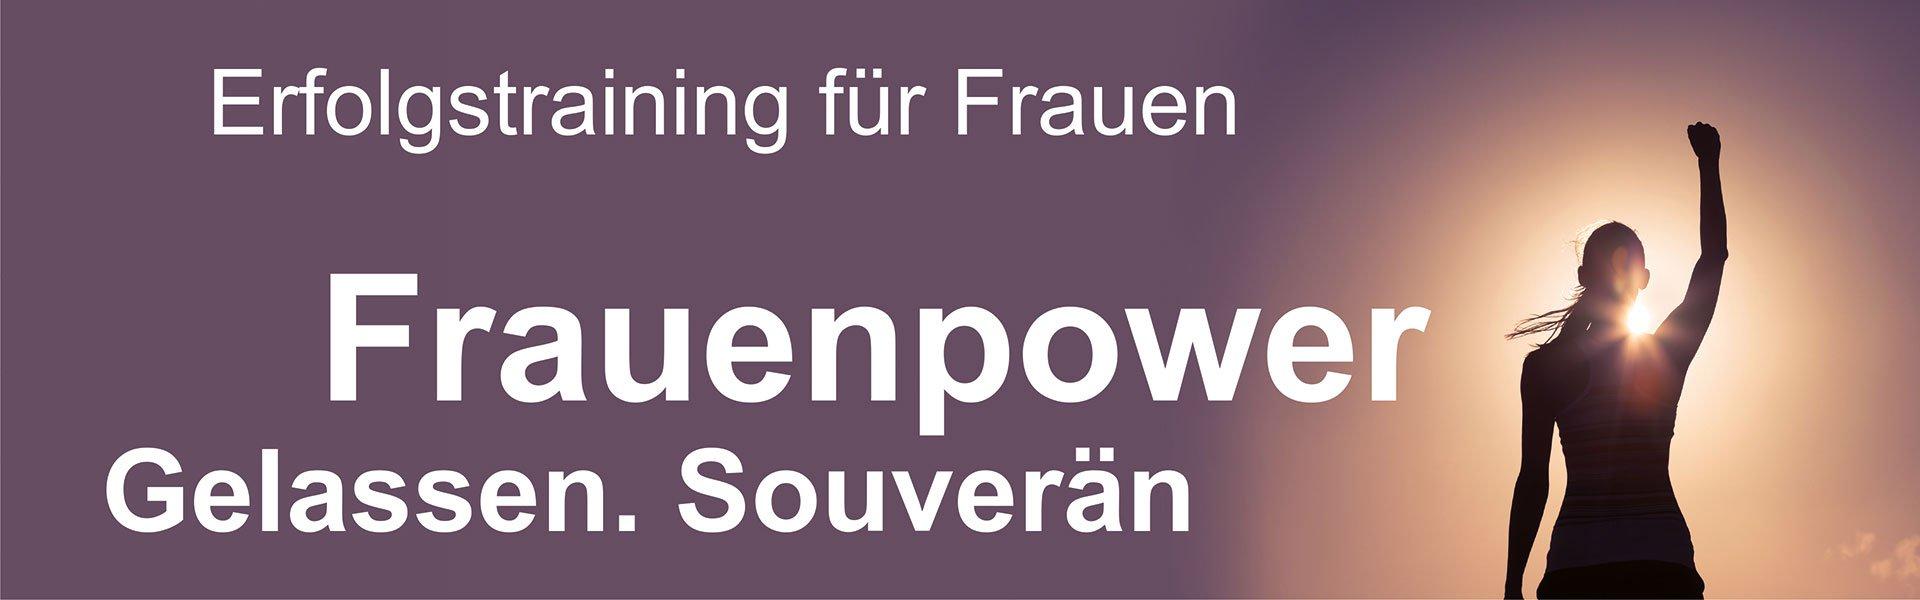 Live Online-Training: Frauenpower - Mentale Stärke für Frauen - Antje Heimsoeth